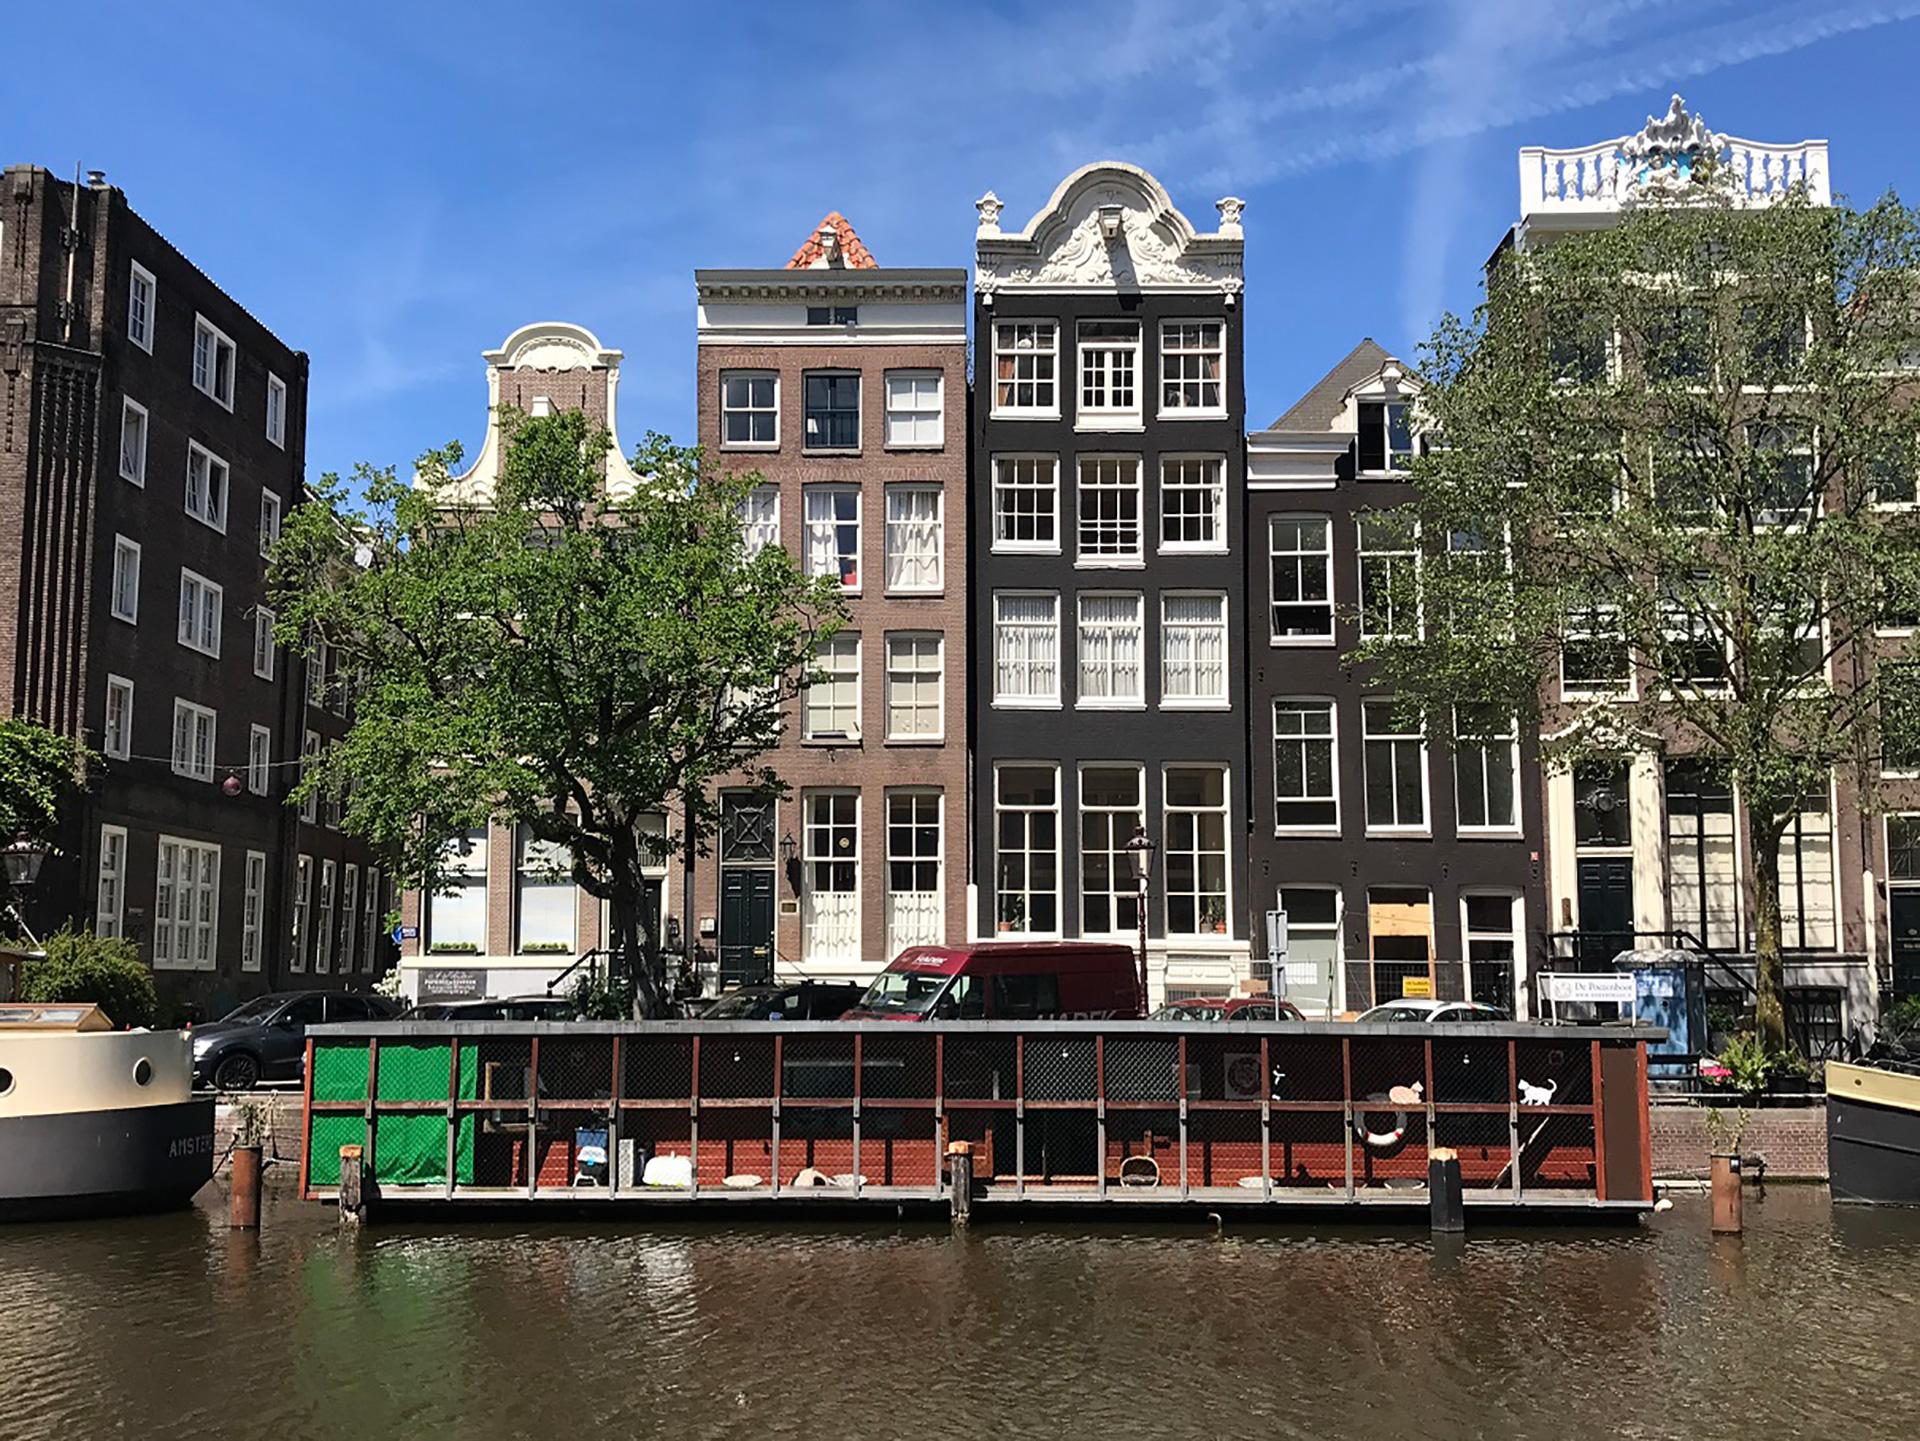 De Poezenboot! We Brought Coffee To Amsterdam's Delightful Floating Cat Charity photo